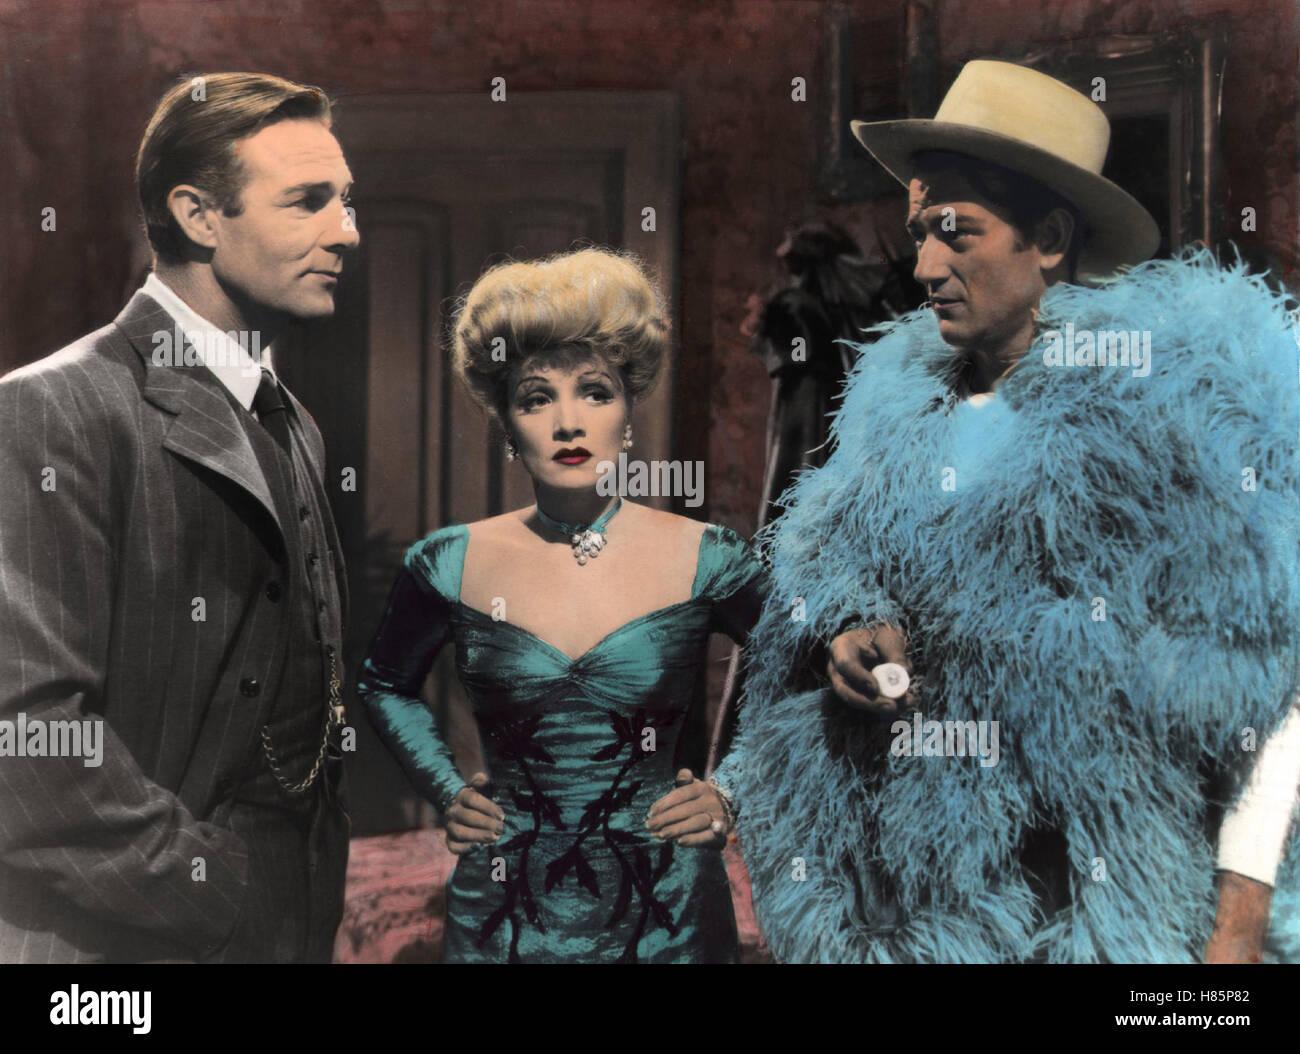 Mourir, Freibeuterin (LES SPOILERS) USA 1942, Regie: Ray Enright, RANDOLPH SCOTT, Marlene Dietrich, JOHN WAYNE, Ausdruck: Federboa Cowboyhut, Banque D'Images